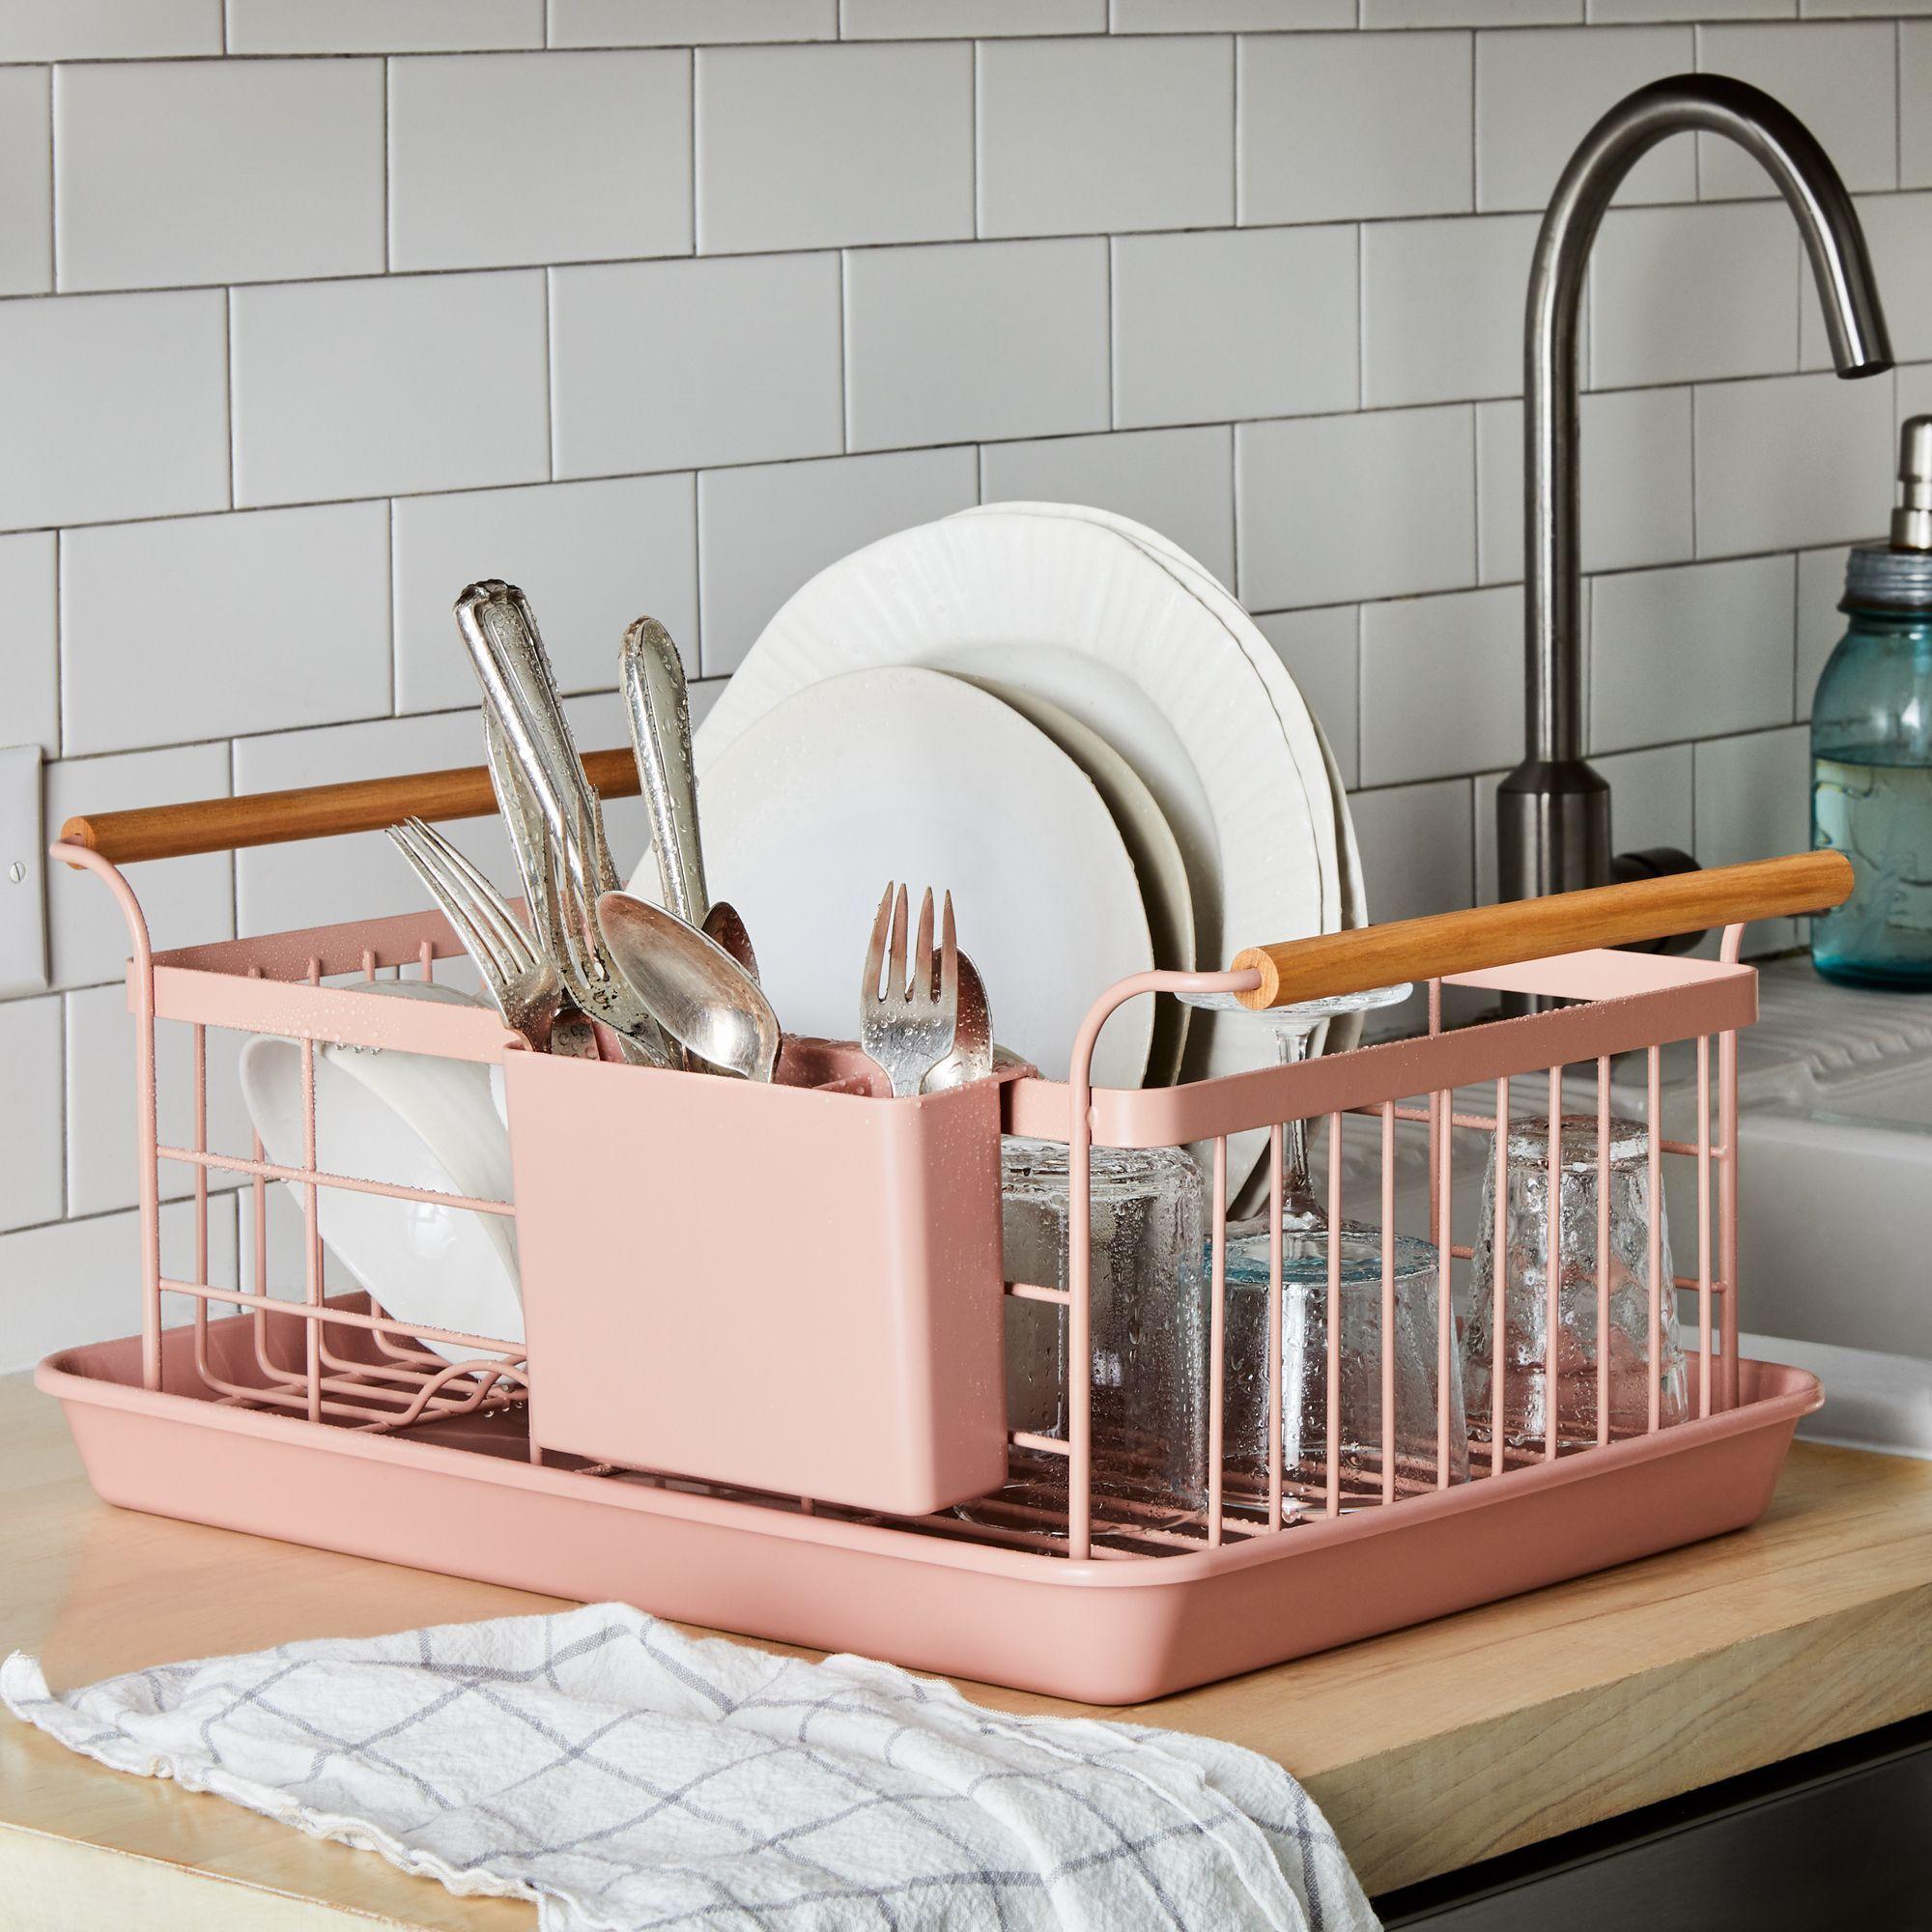 Wood-Handled Dish Rack in Blush